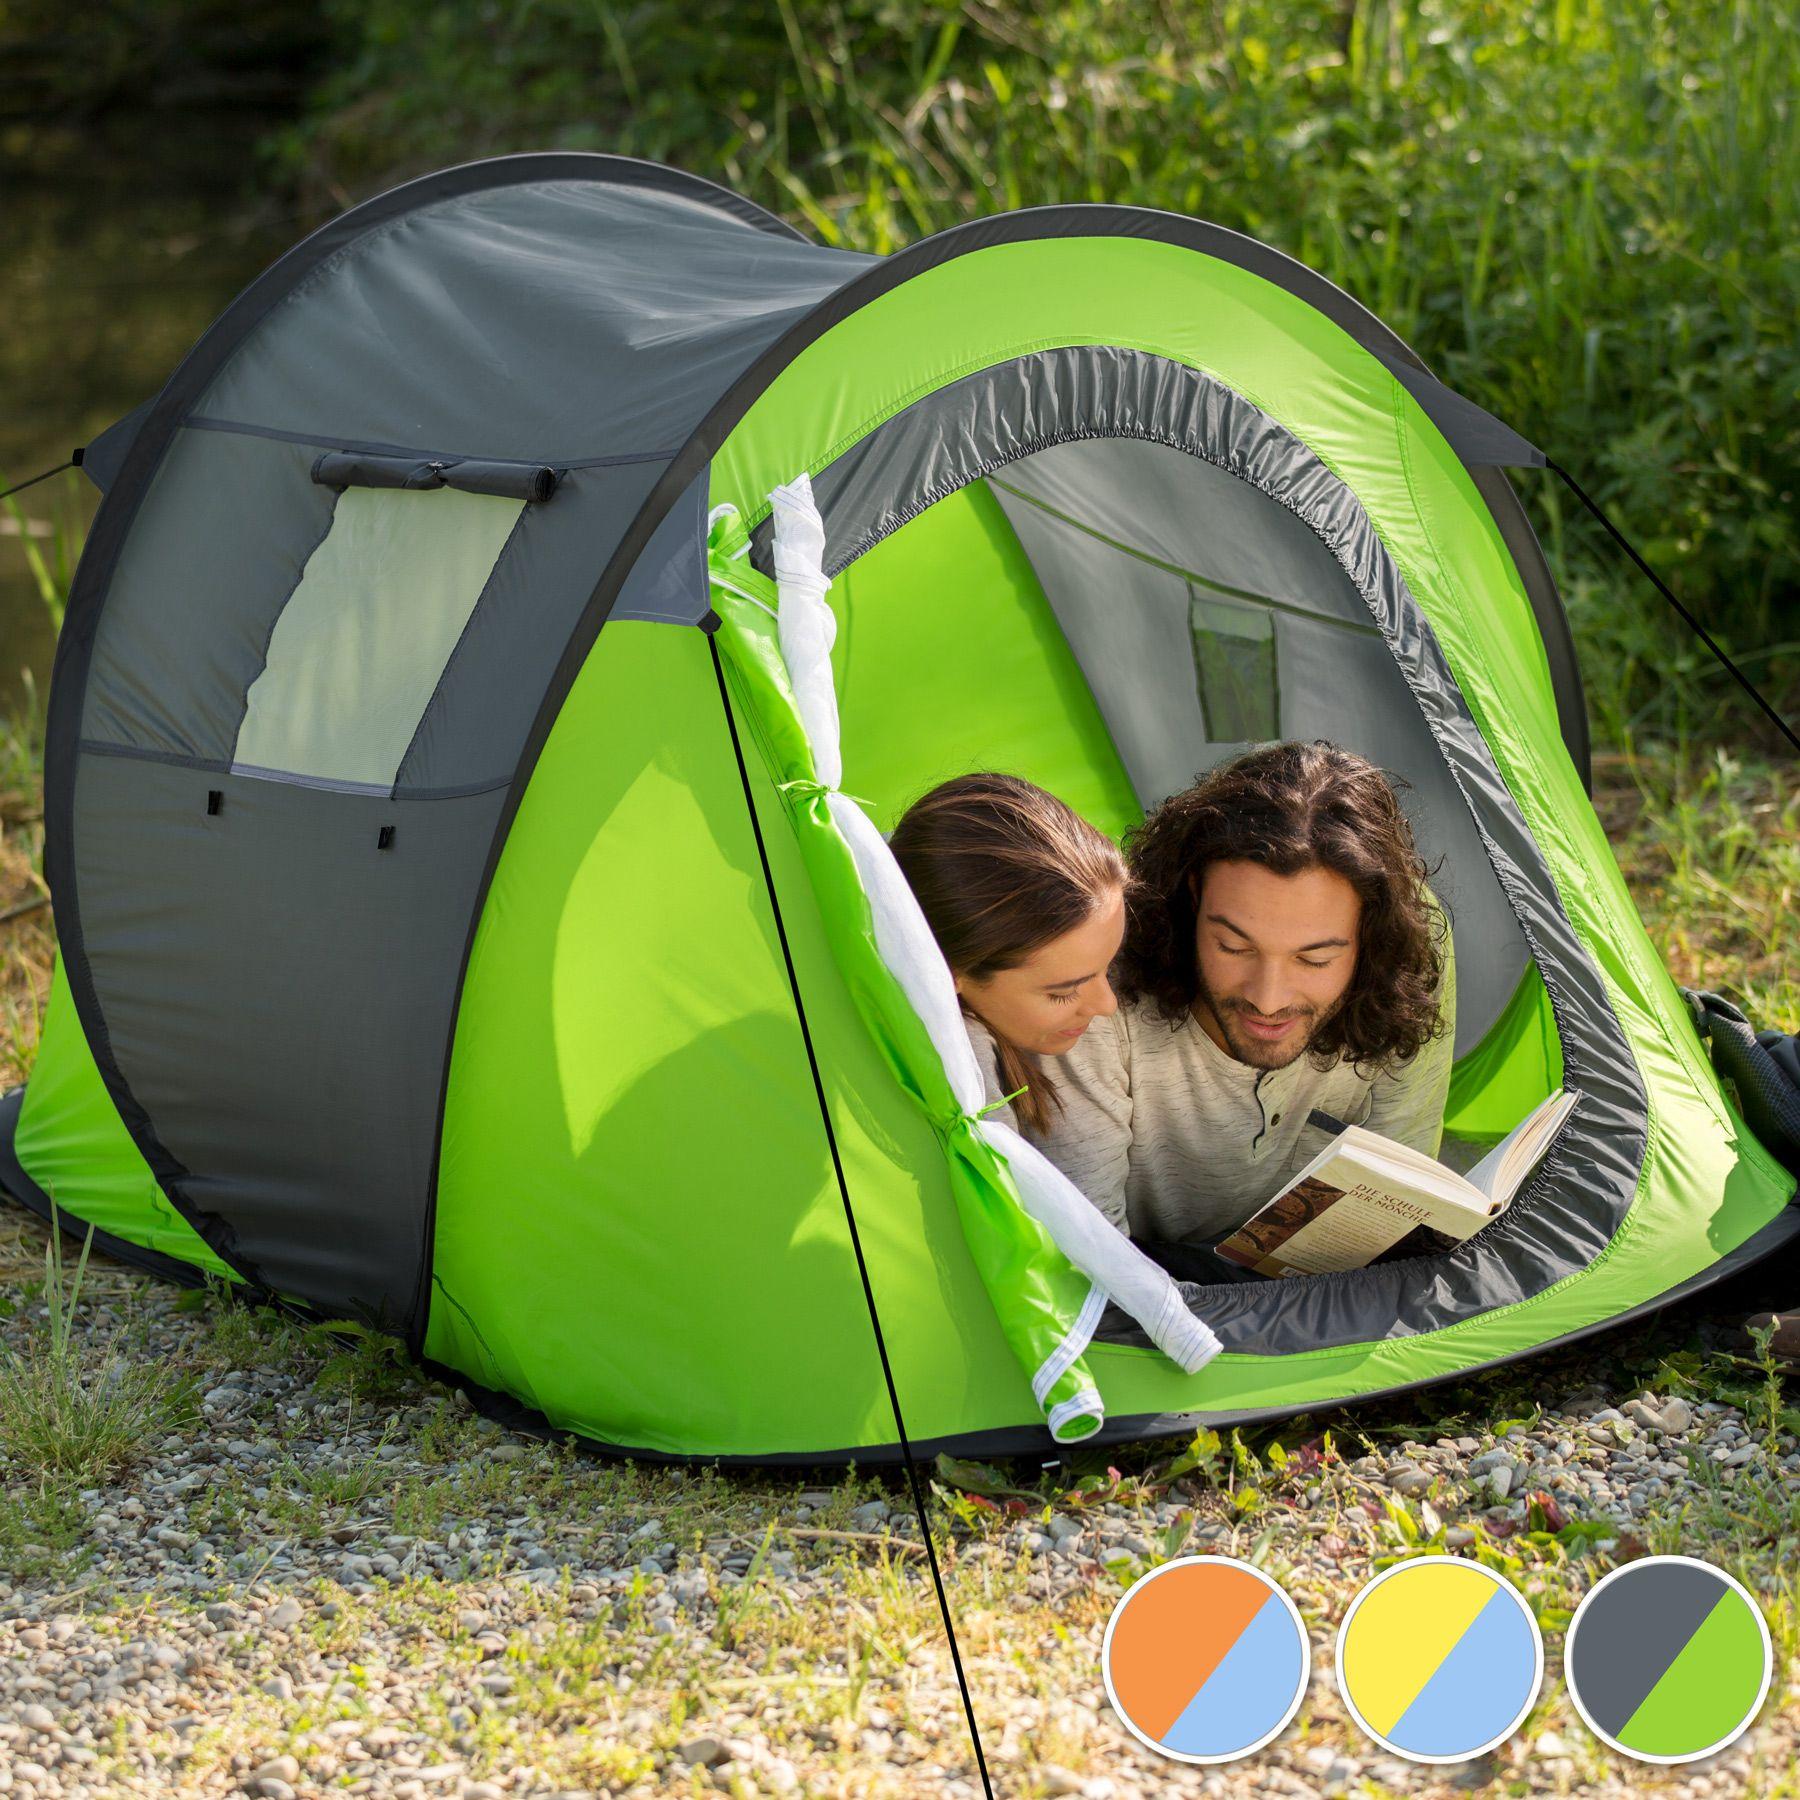 wurfzelt pop up zelt automatikzelt camping strand trekkingzelt 2 personen gr n ebay. Black Bedroom Furniture Sets. Home Design Ideas